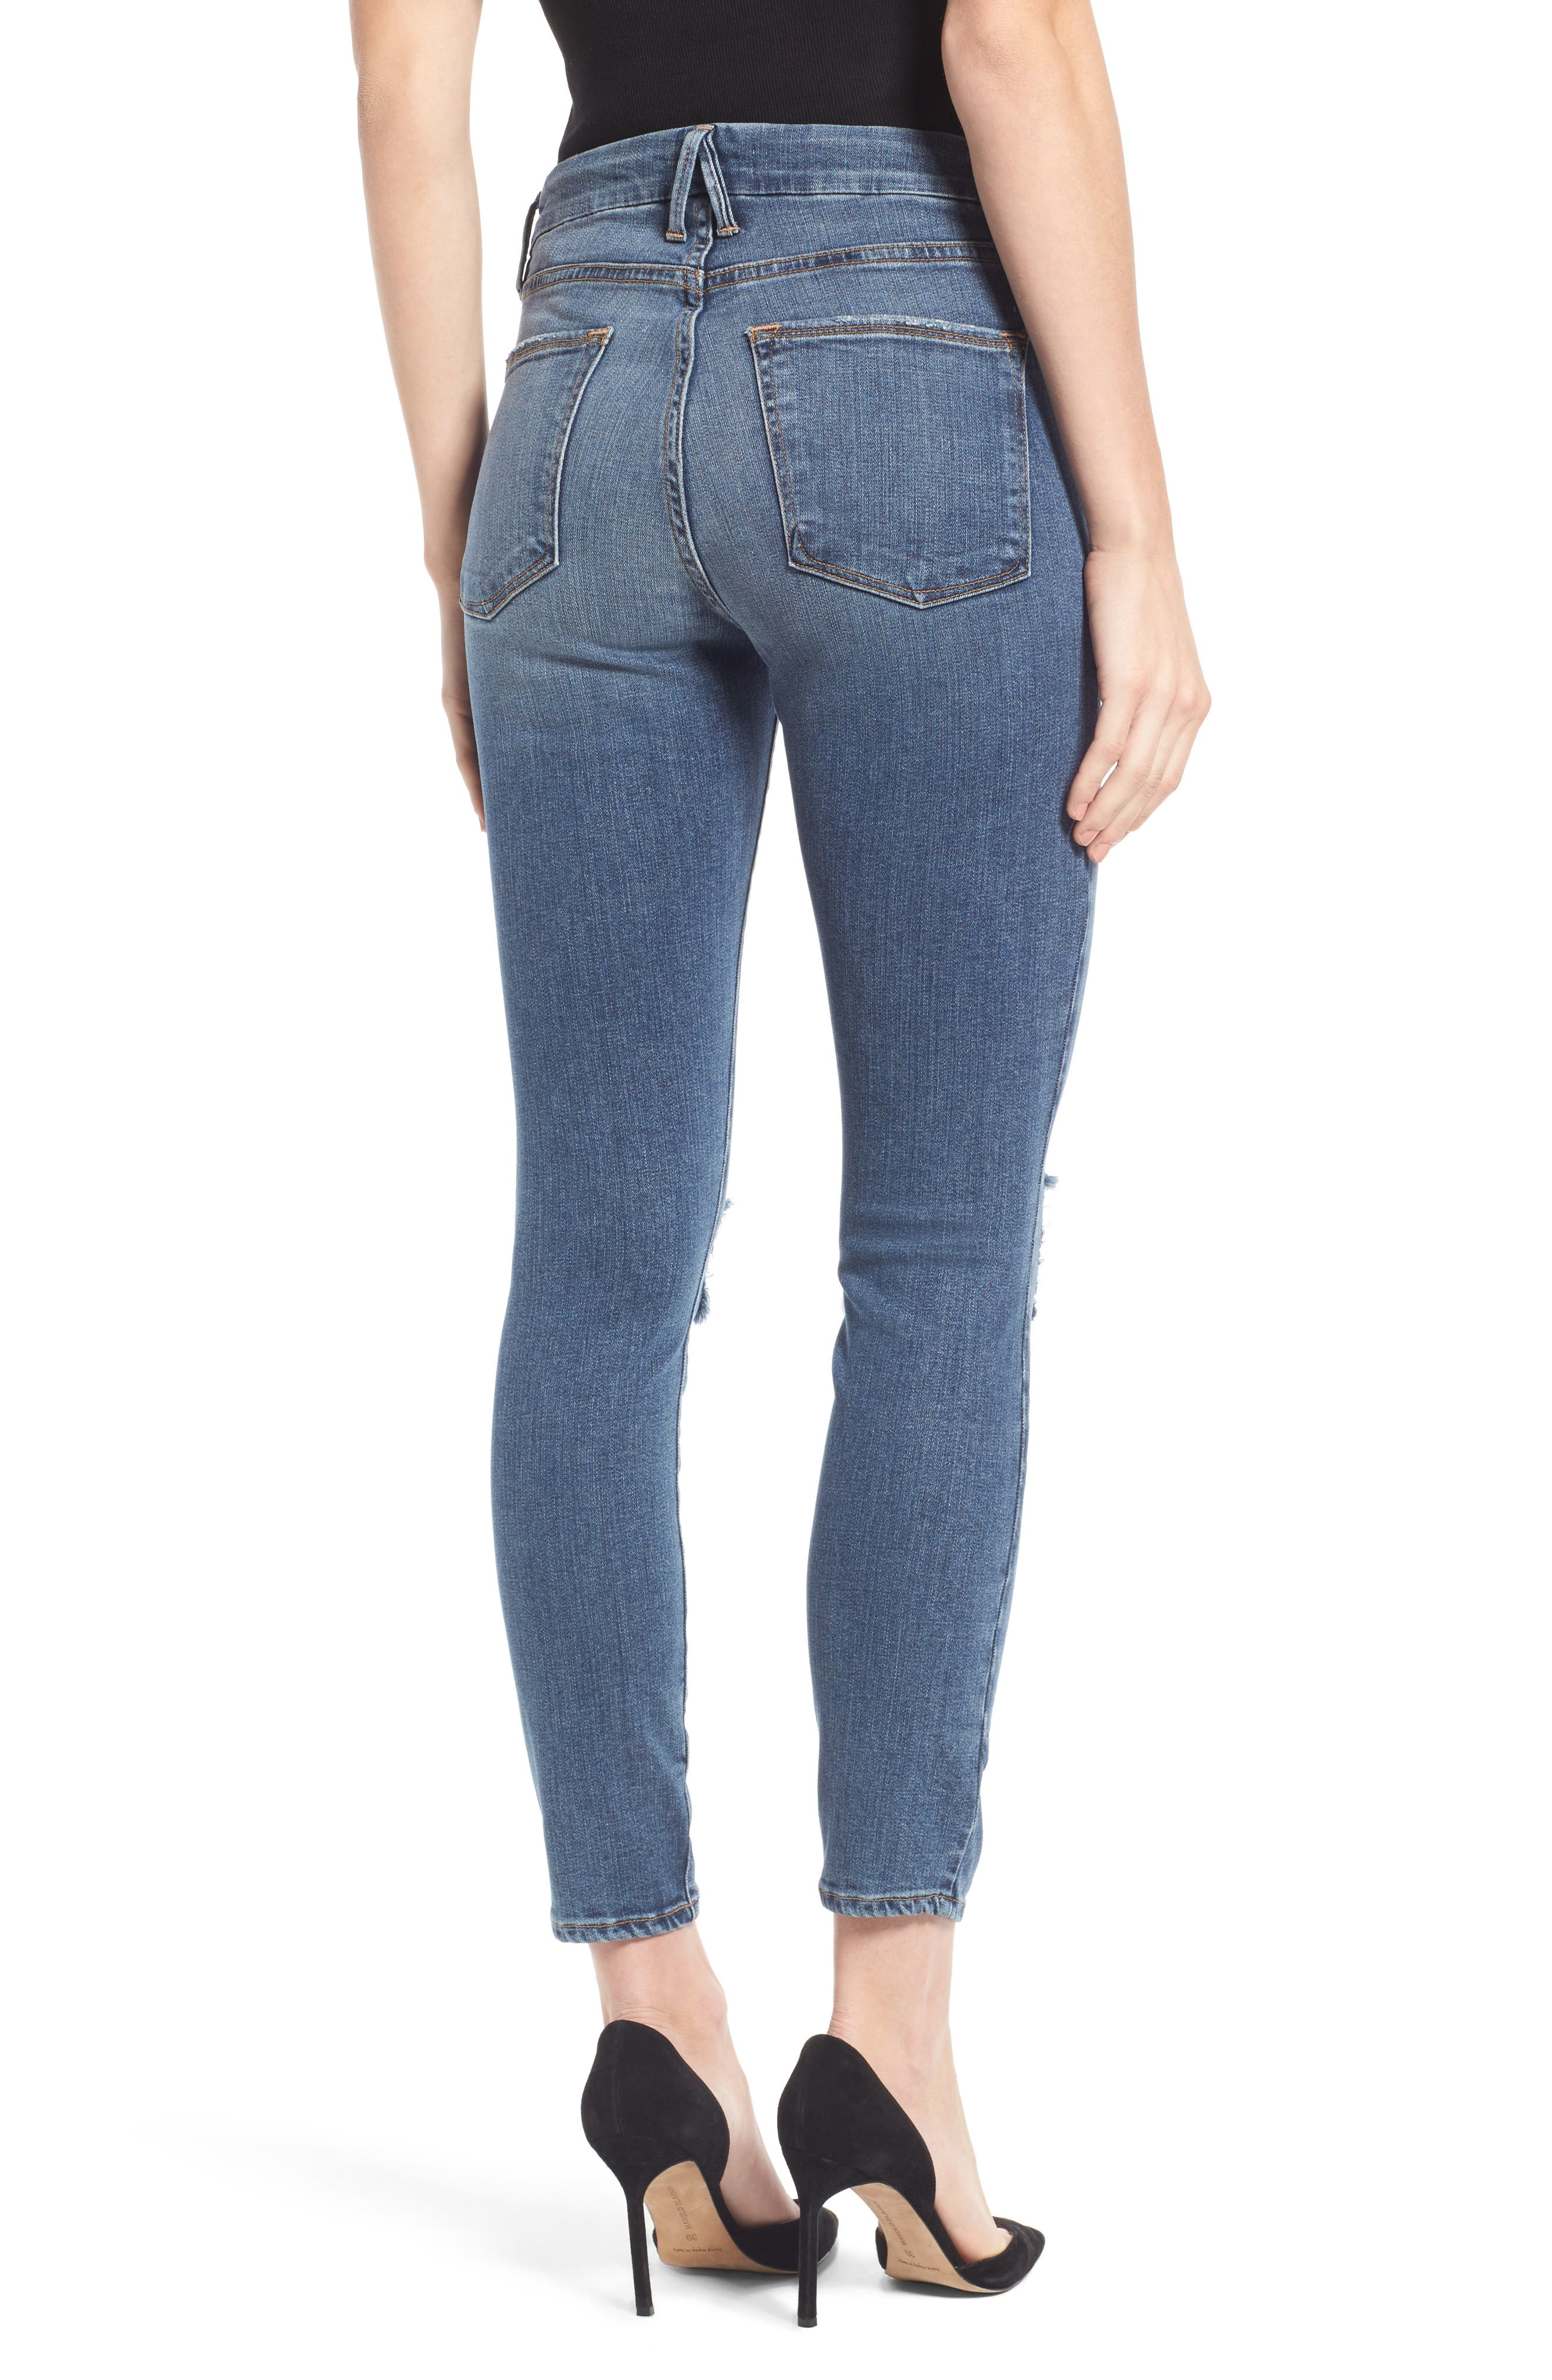 Alternate Image 2  - Good American Good Legs High Waist Ankle Skinny Jeans (Blue 084) (Regular & Plus Size)